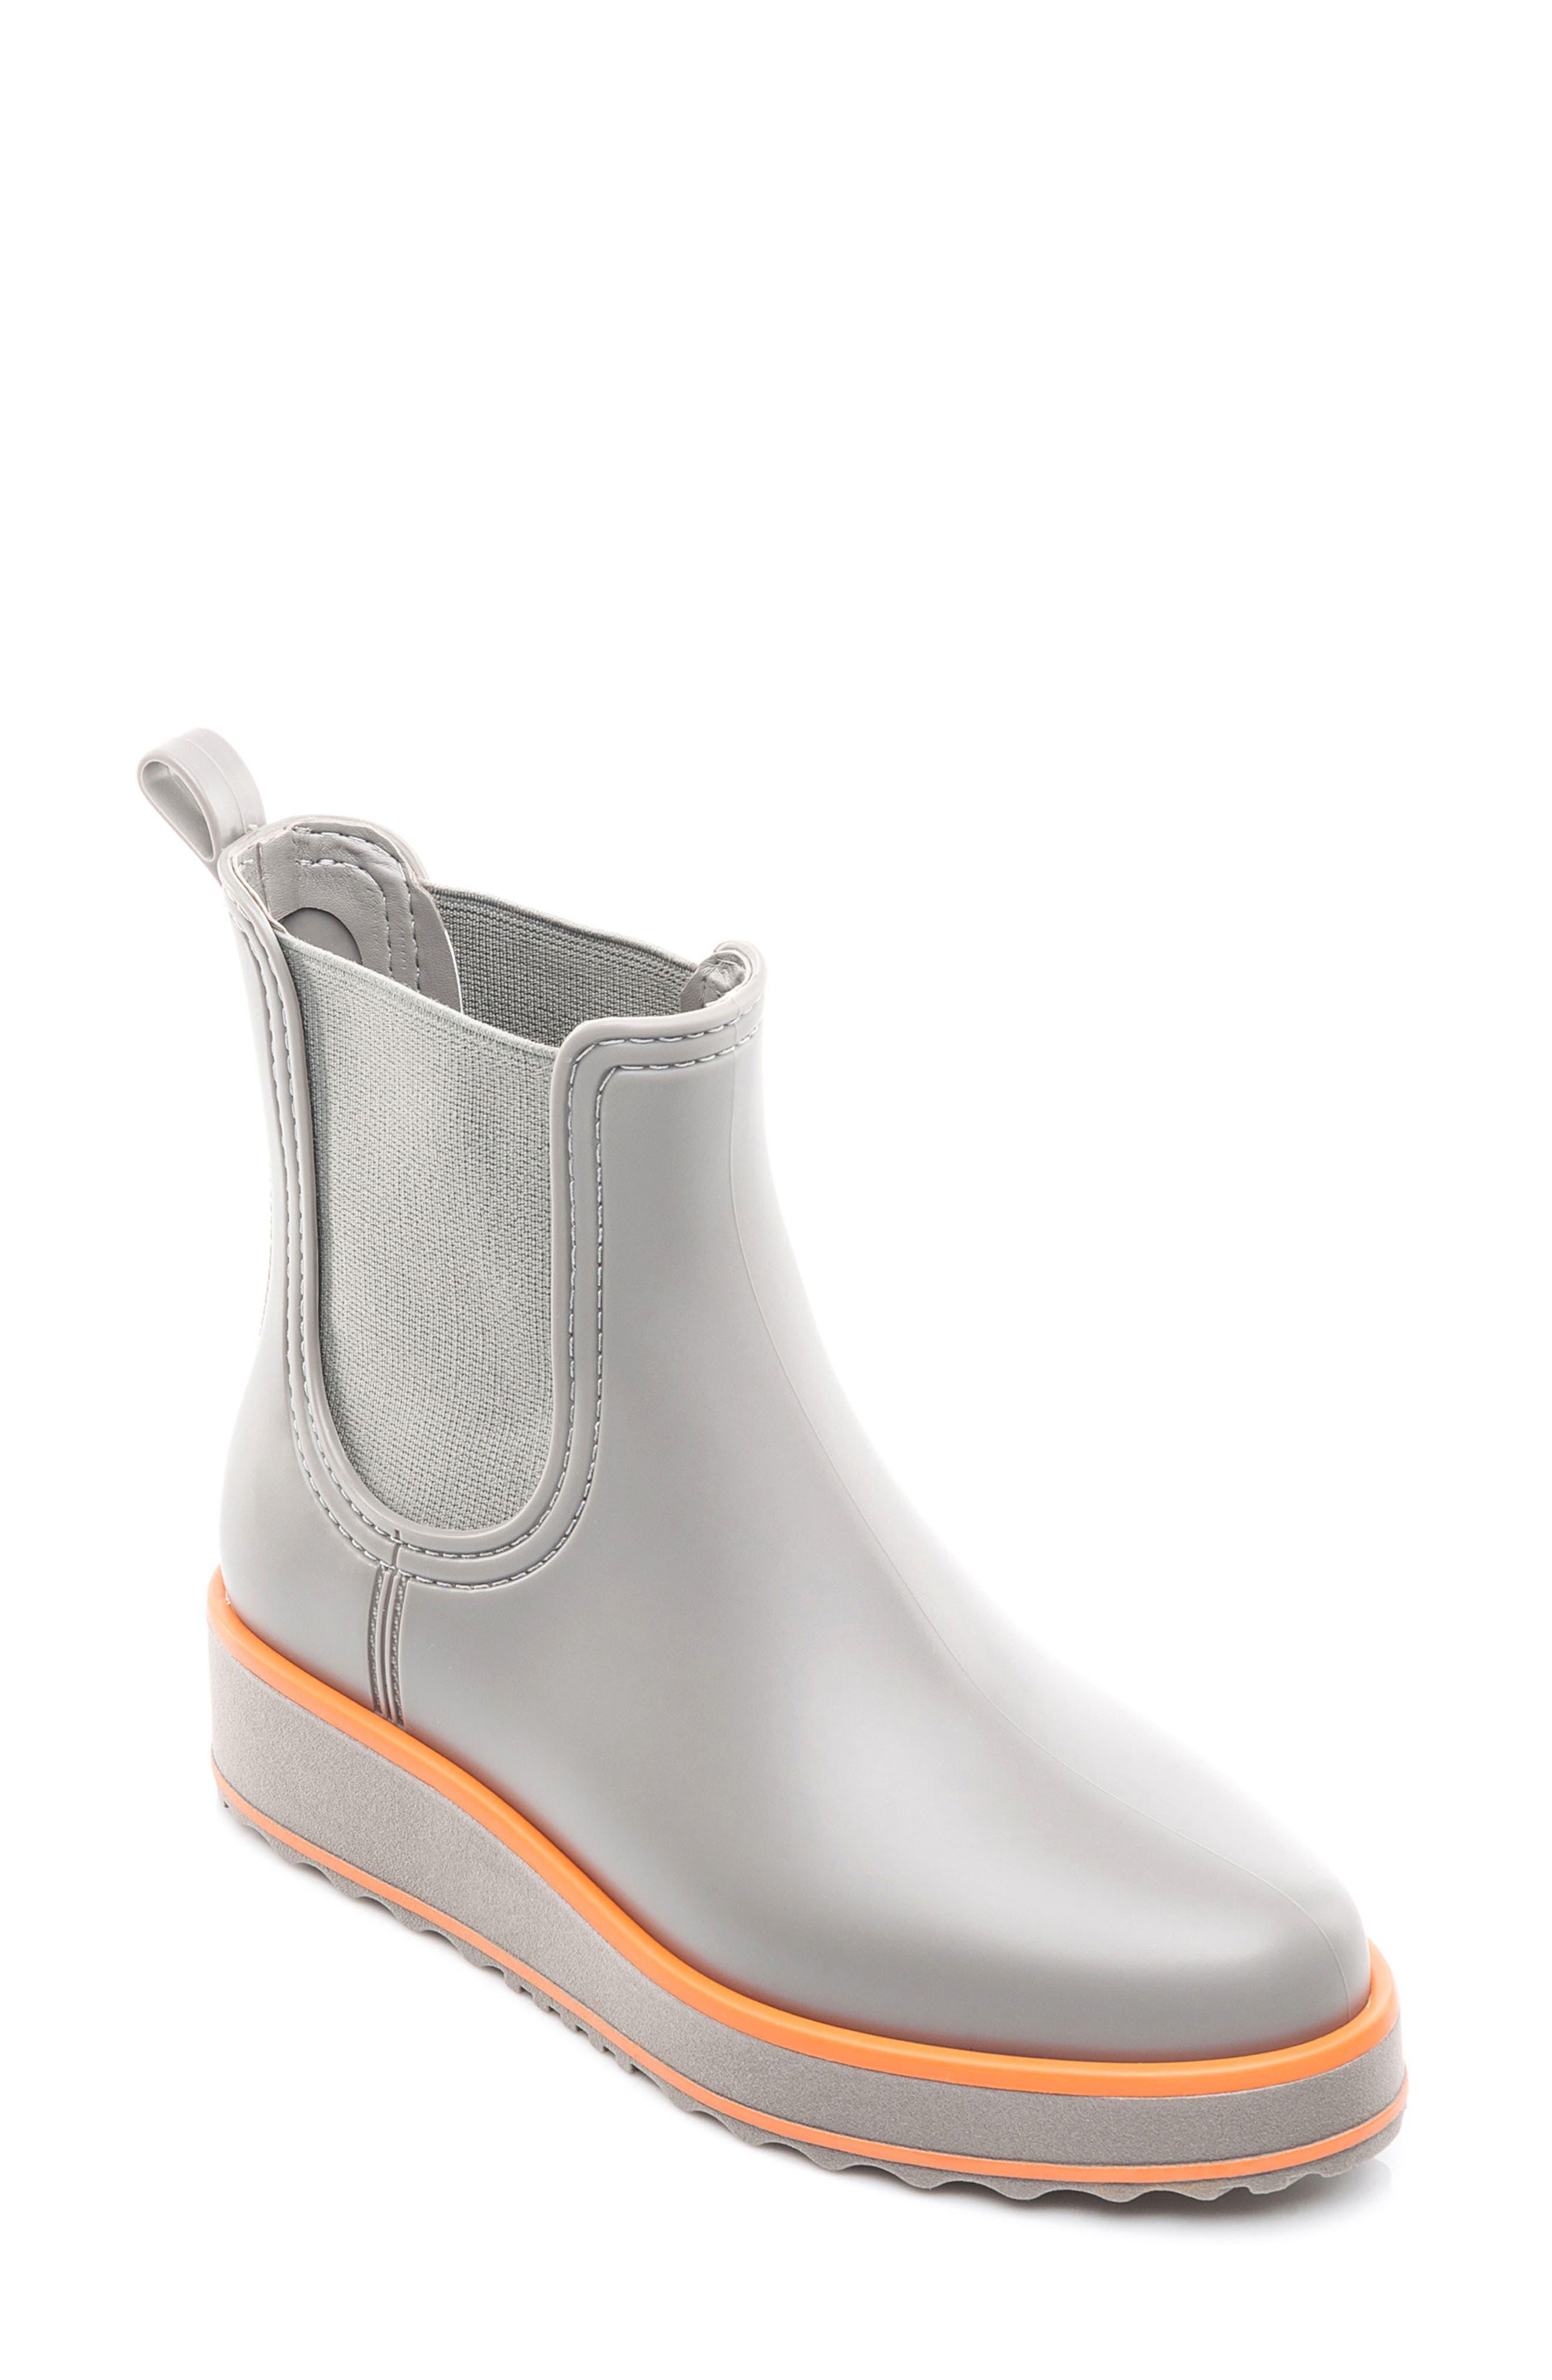 Main Image - Bernardo Footwear Wila Rain Boot (Women)